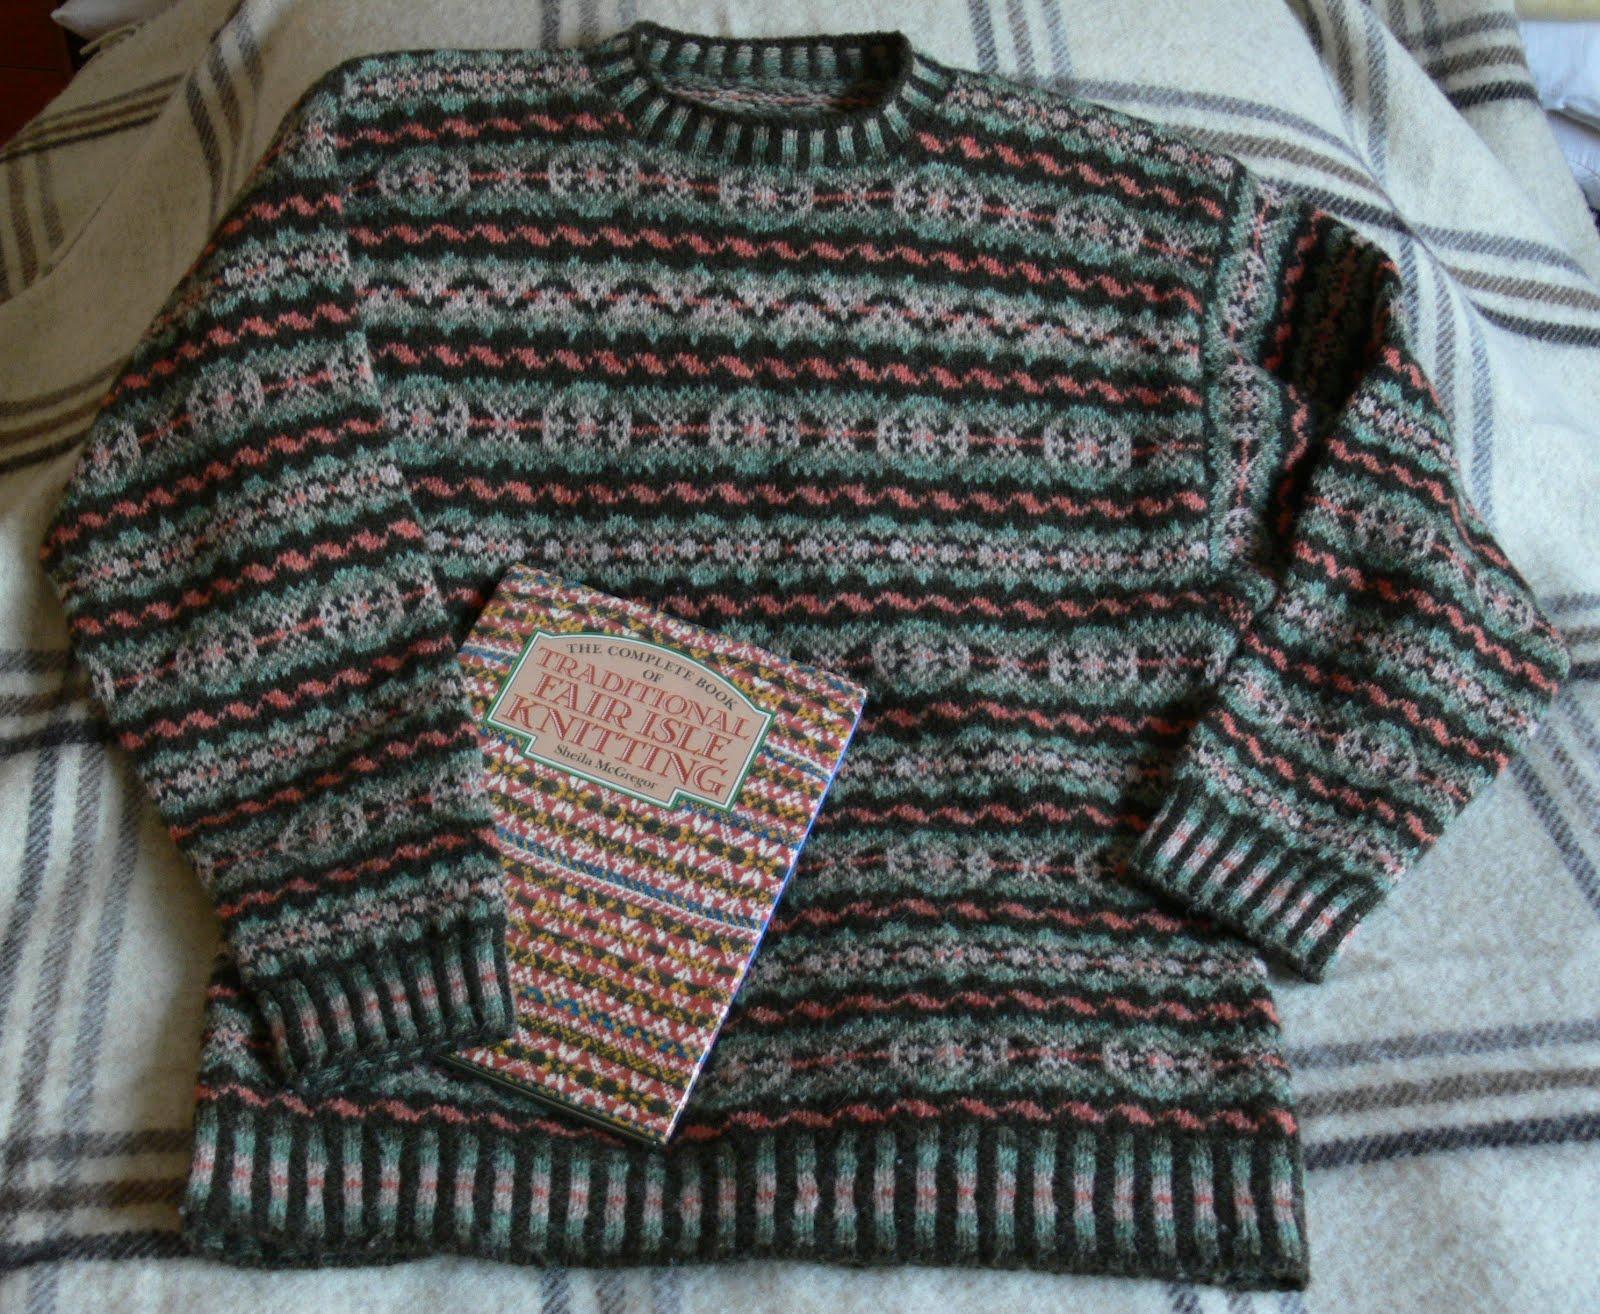 A Yarn Over Needles Fair Isle Jumper For Sale